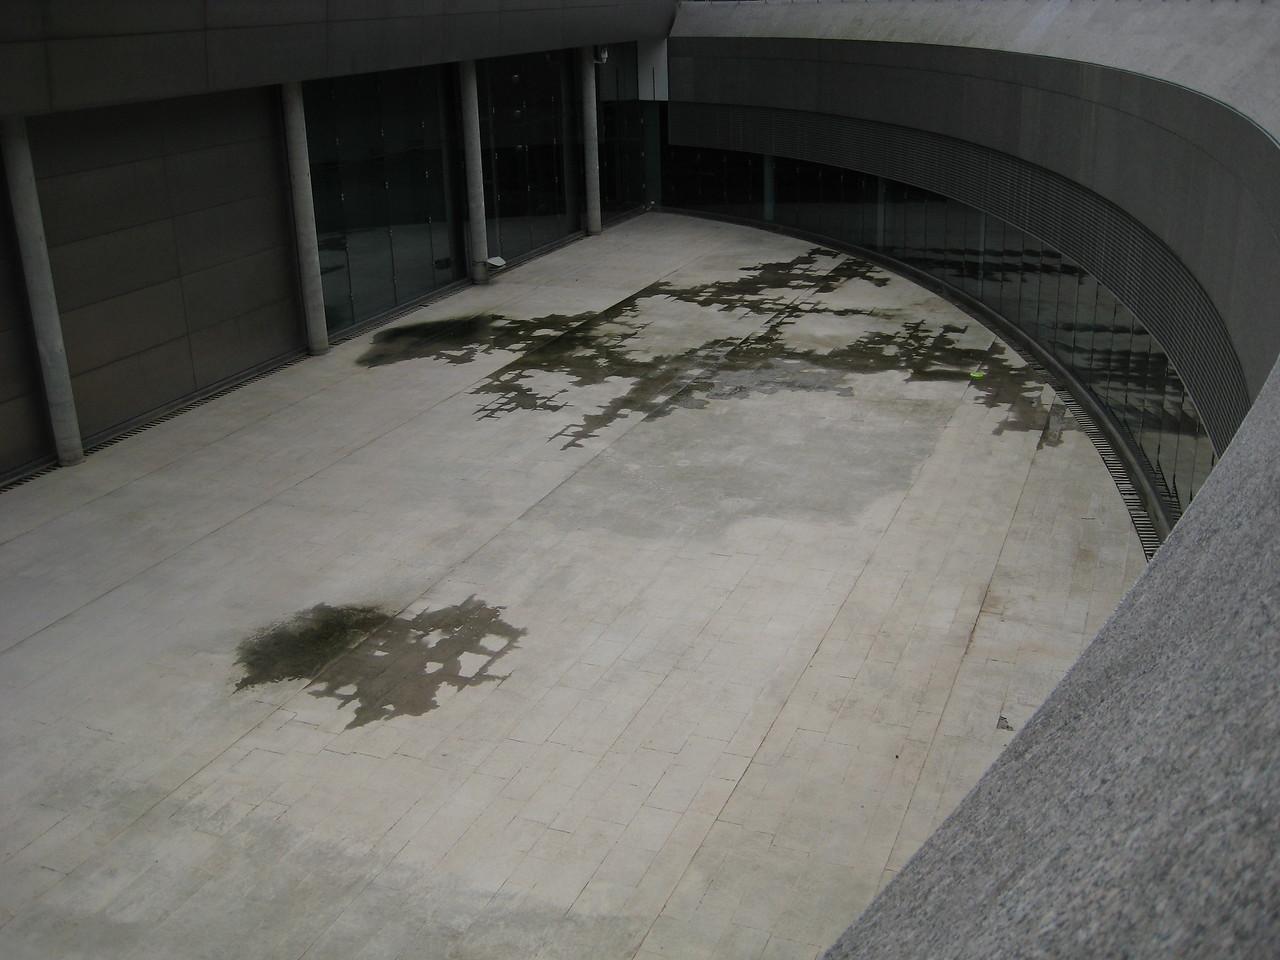 Van Gough museum - exterior